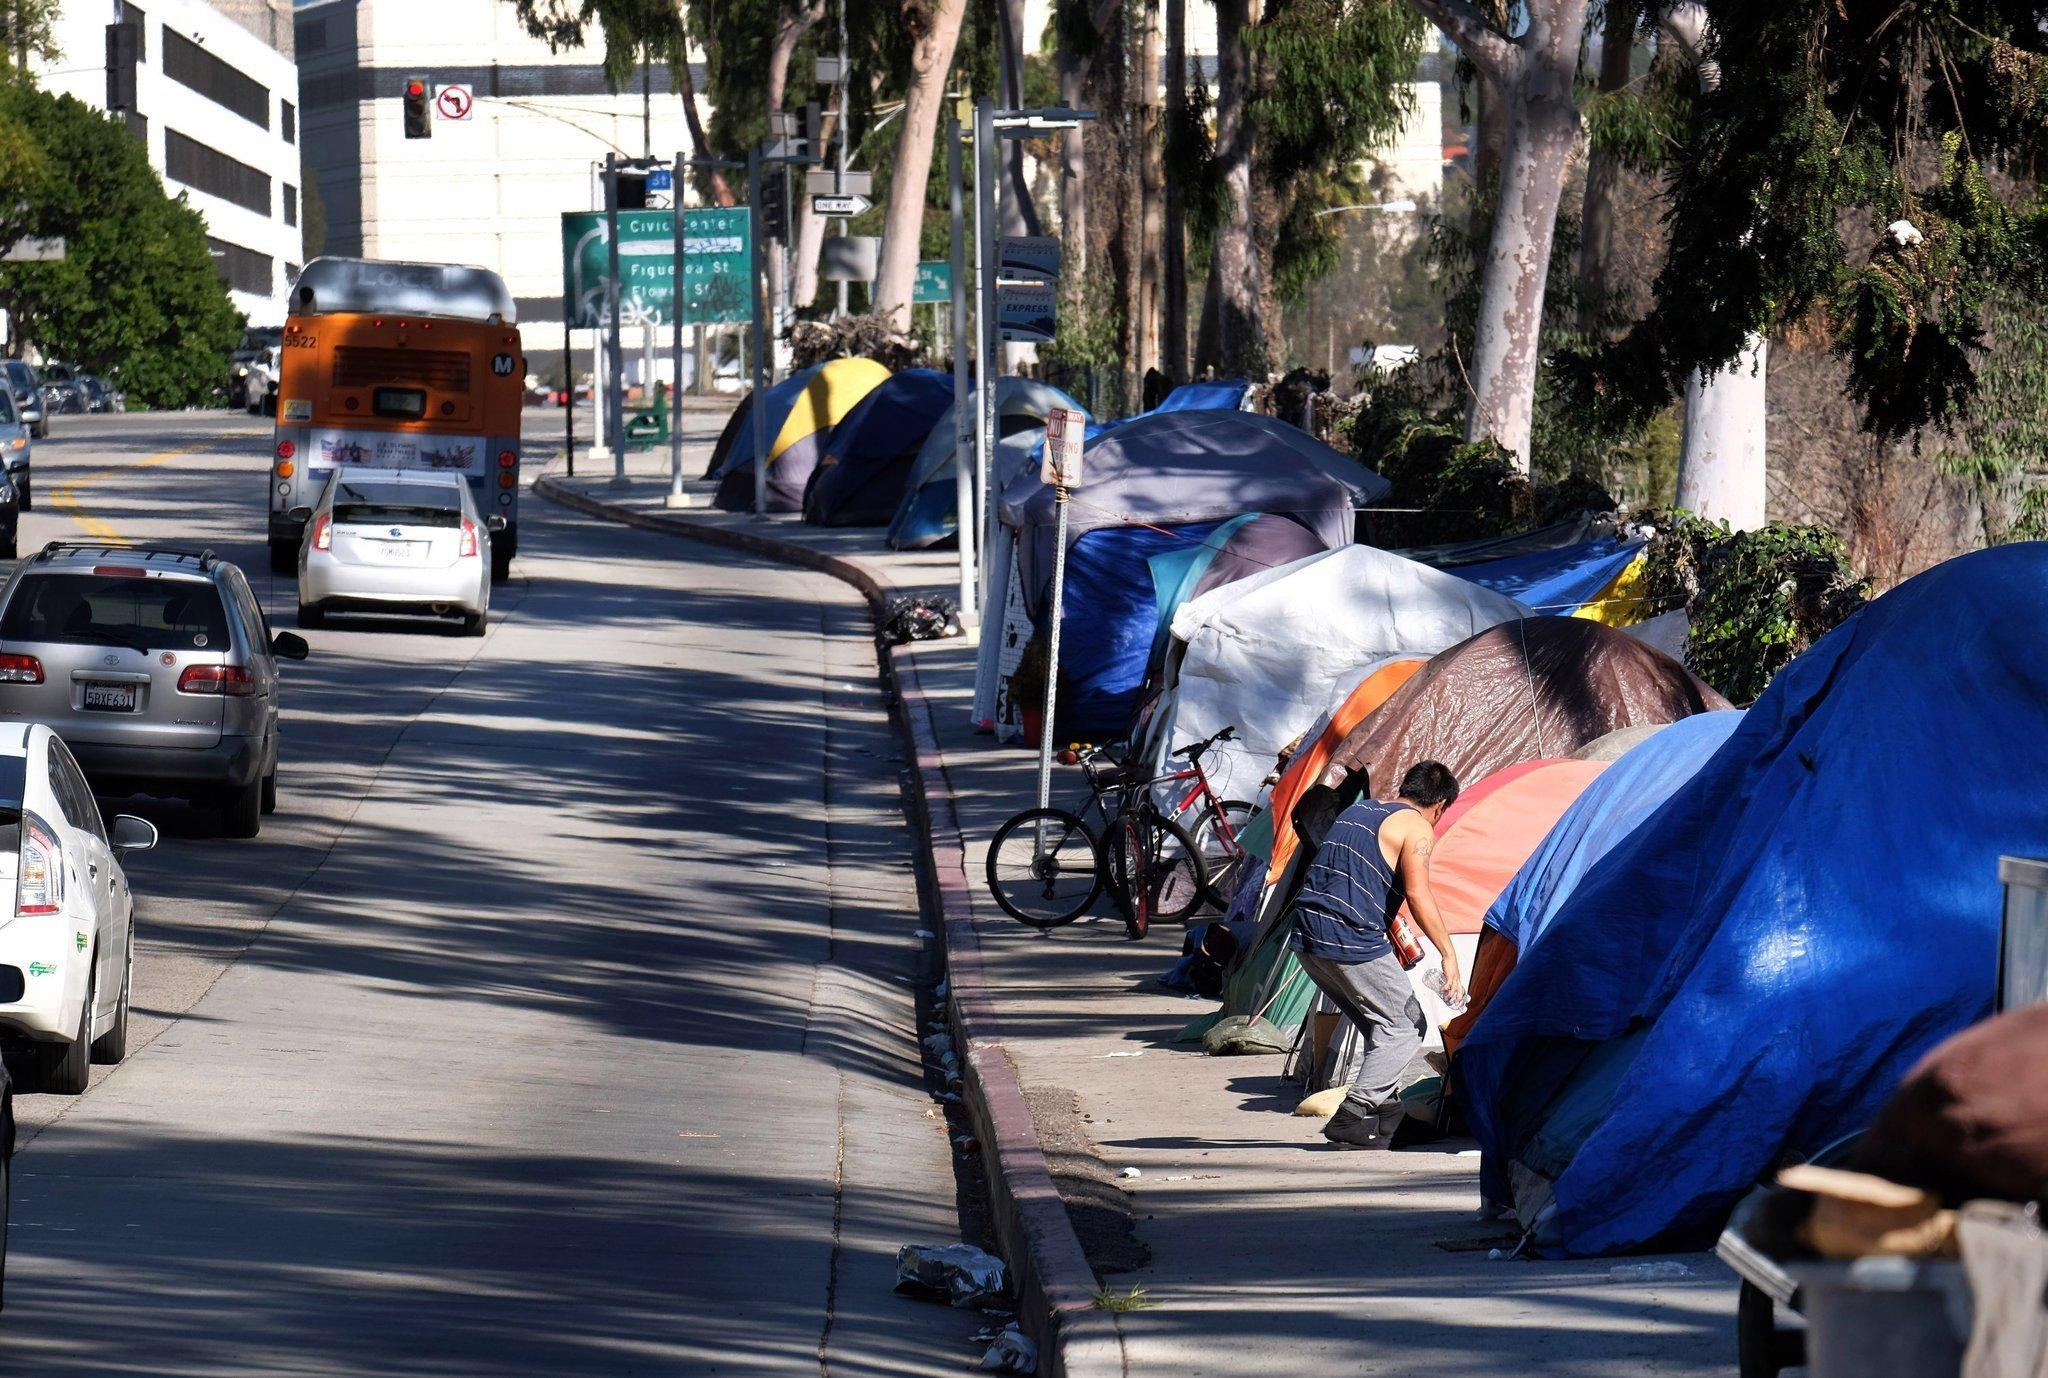 Sumber: http://www.trbimg.com/img-56bad57a/turbine/la-ed-homelessness-plans-20160210